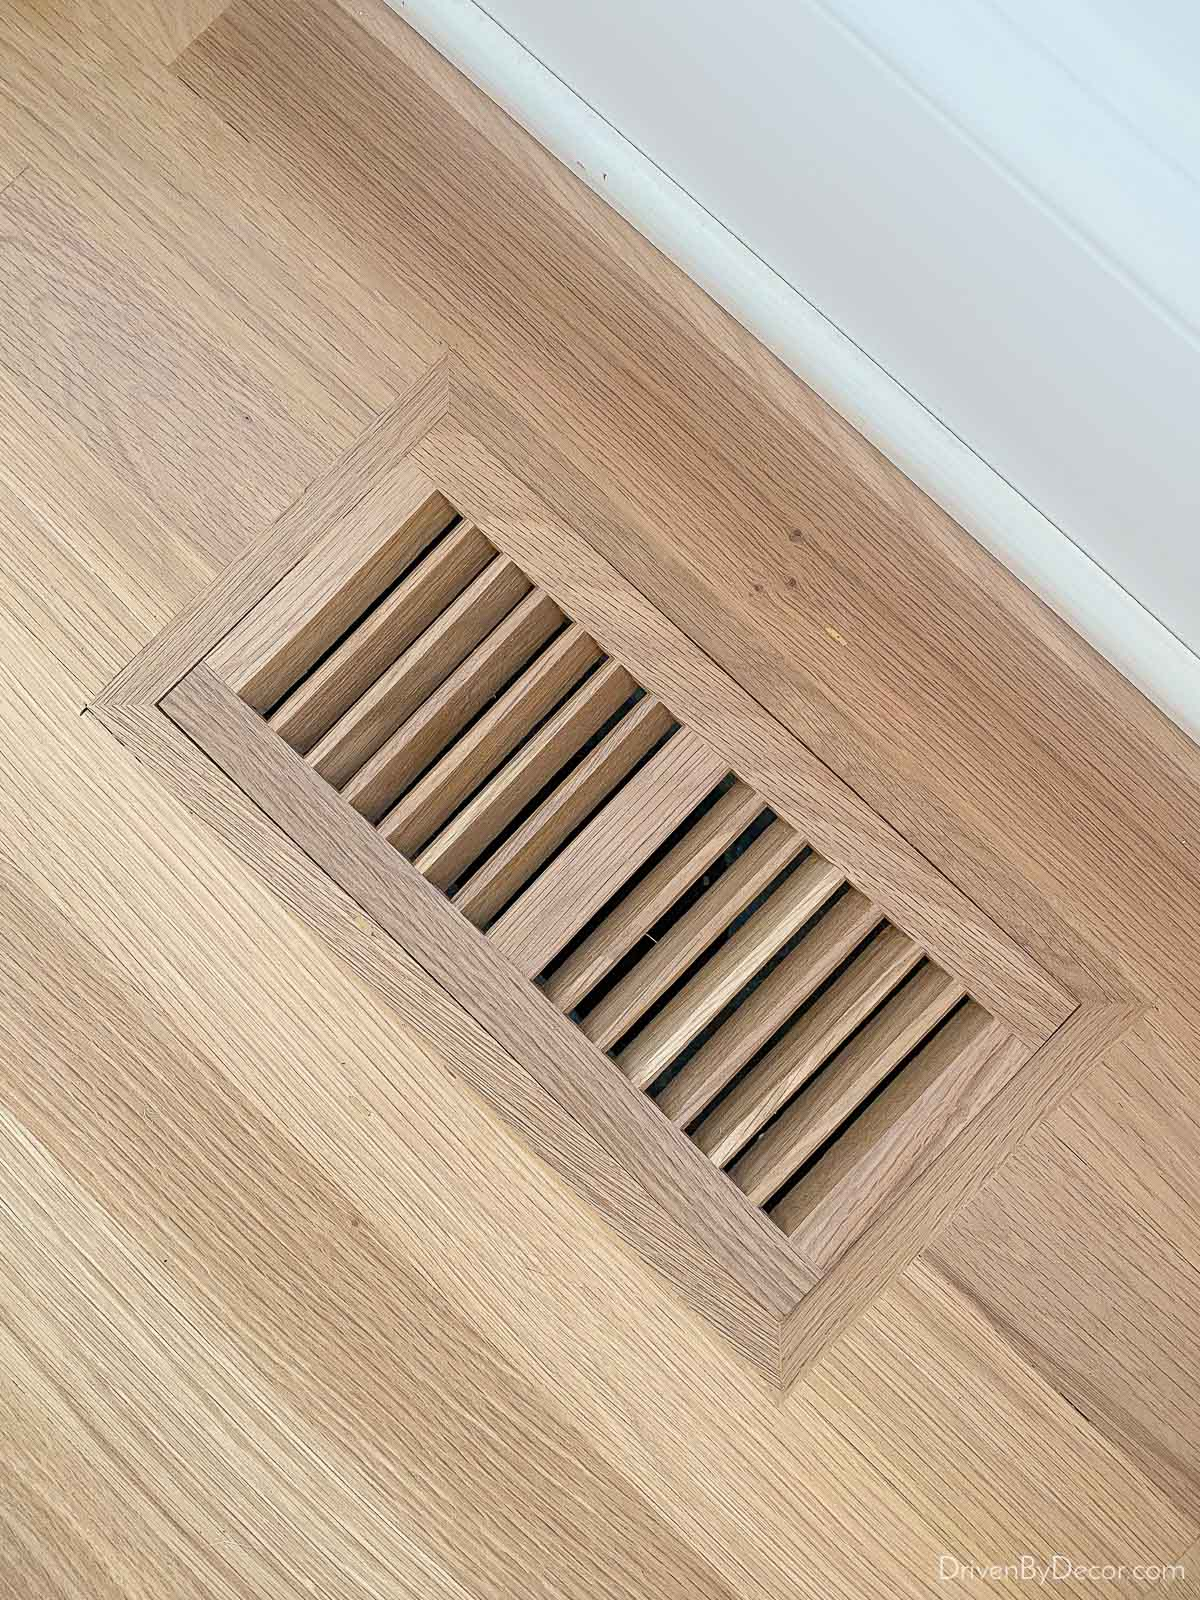 Custom wood floor vent as part of hardwood floor refinishing project